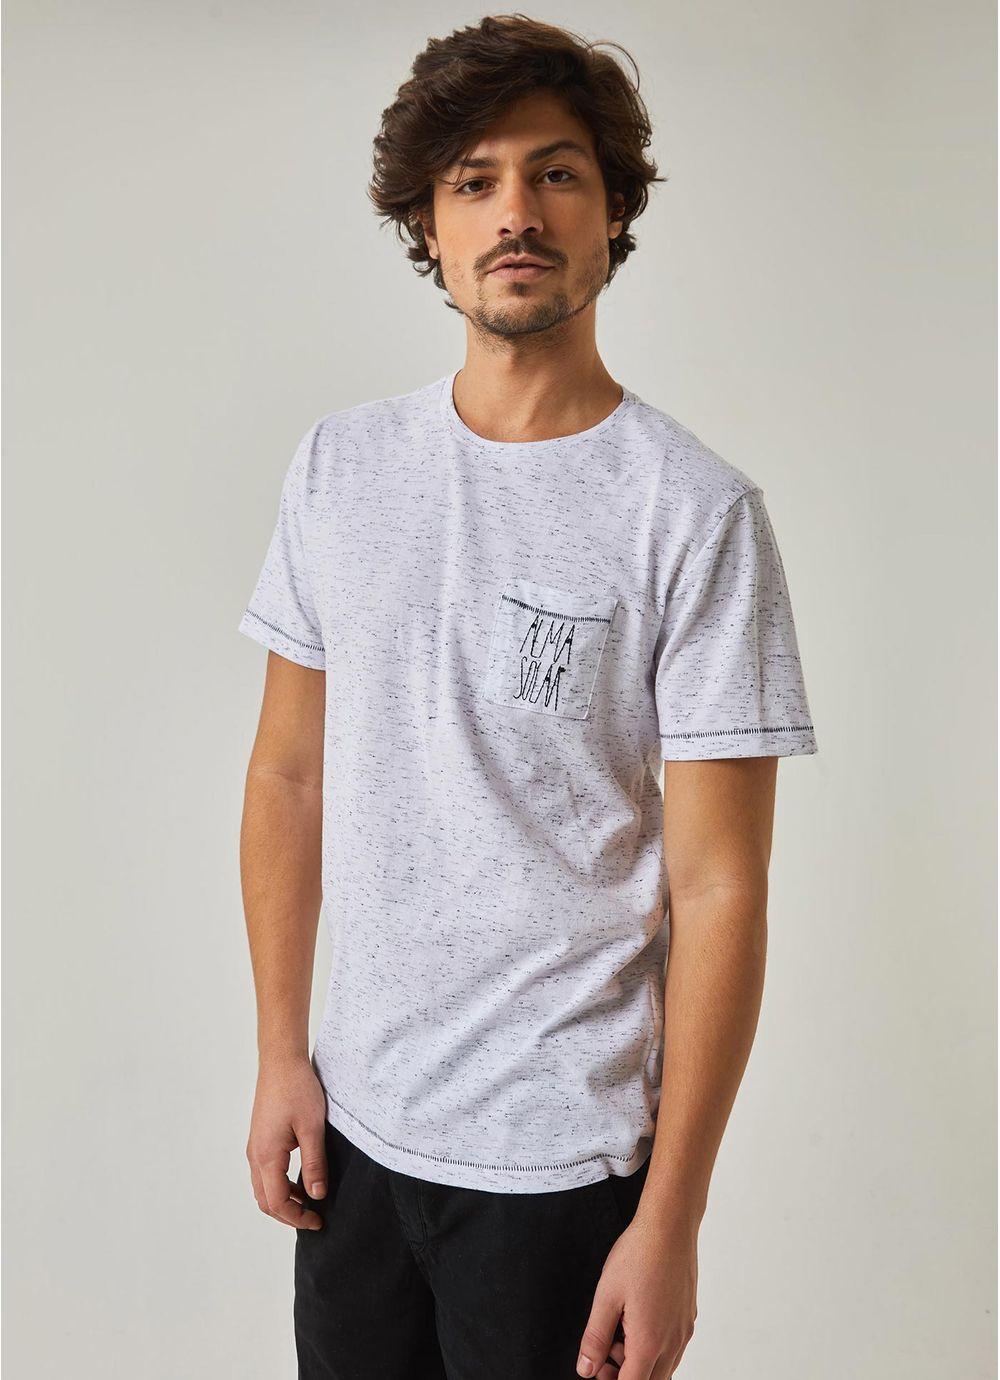 c4caacb833 T-shirt manga curta bolso bordado BRANCO - Compre Online na Redley!